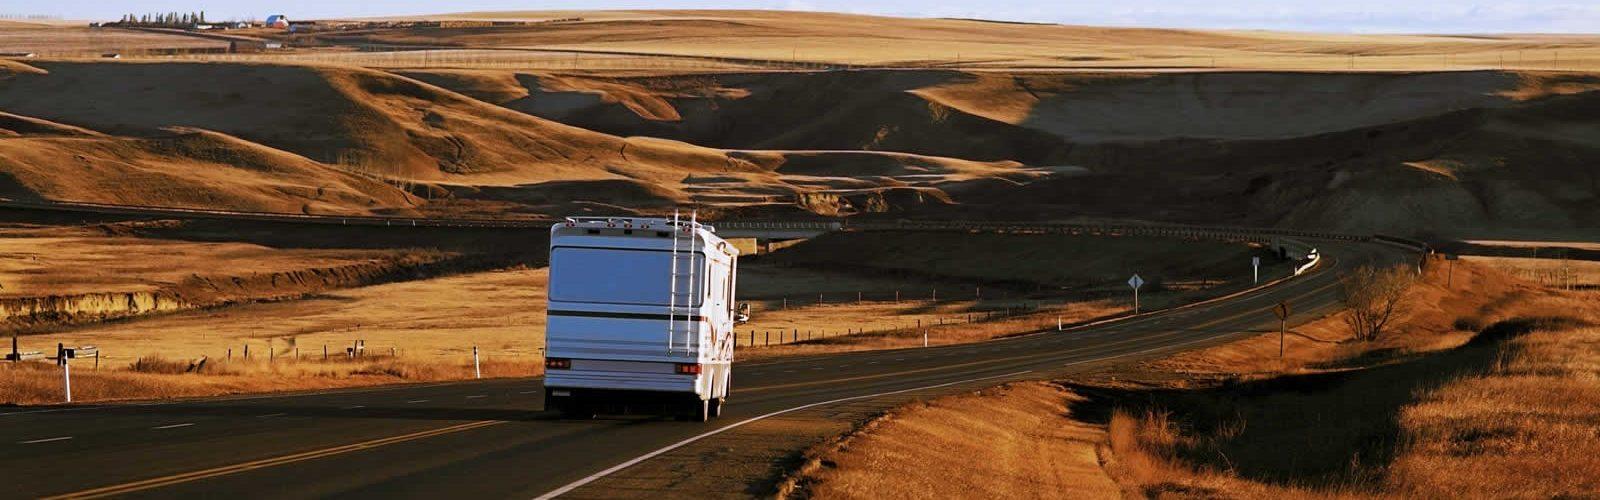 parcs-californiens-rv-camping-car-une3